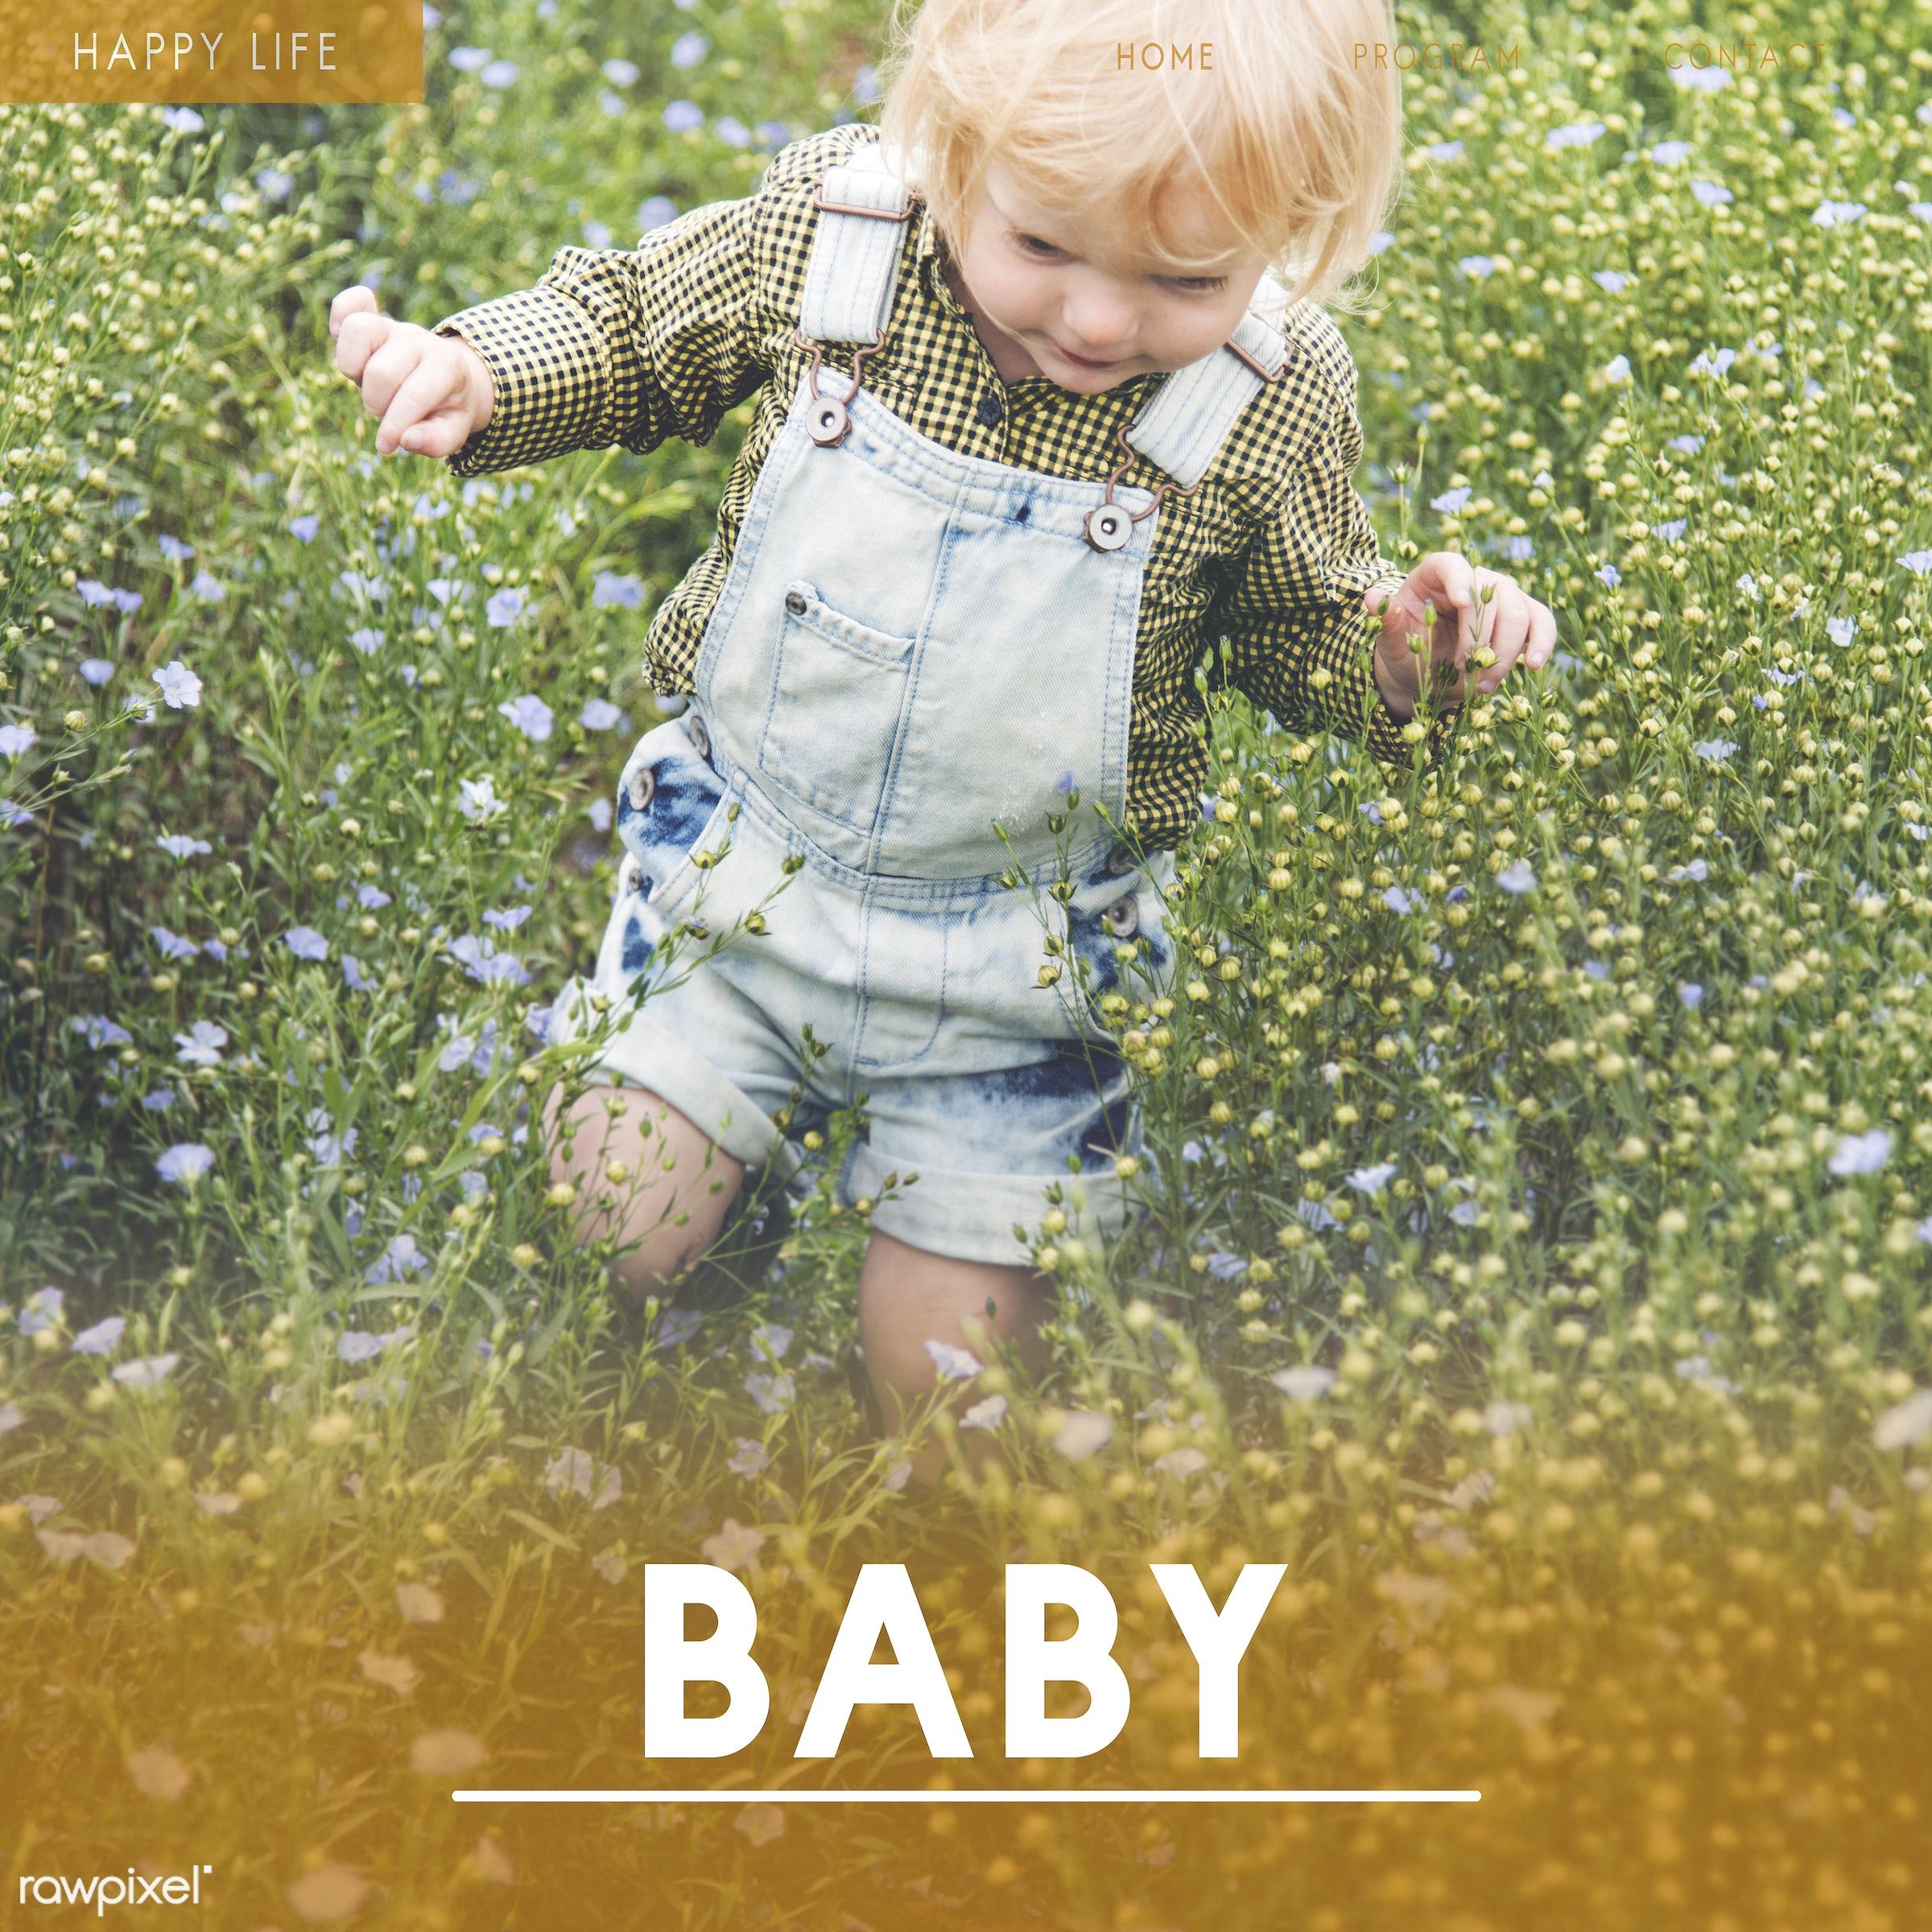 baby, adorable, blameless, blonde, boy, caucasian, child, childhood, children, curiosity, curious, cute, dungarees, flower...